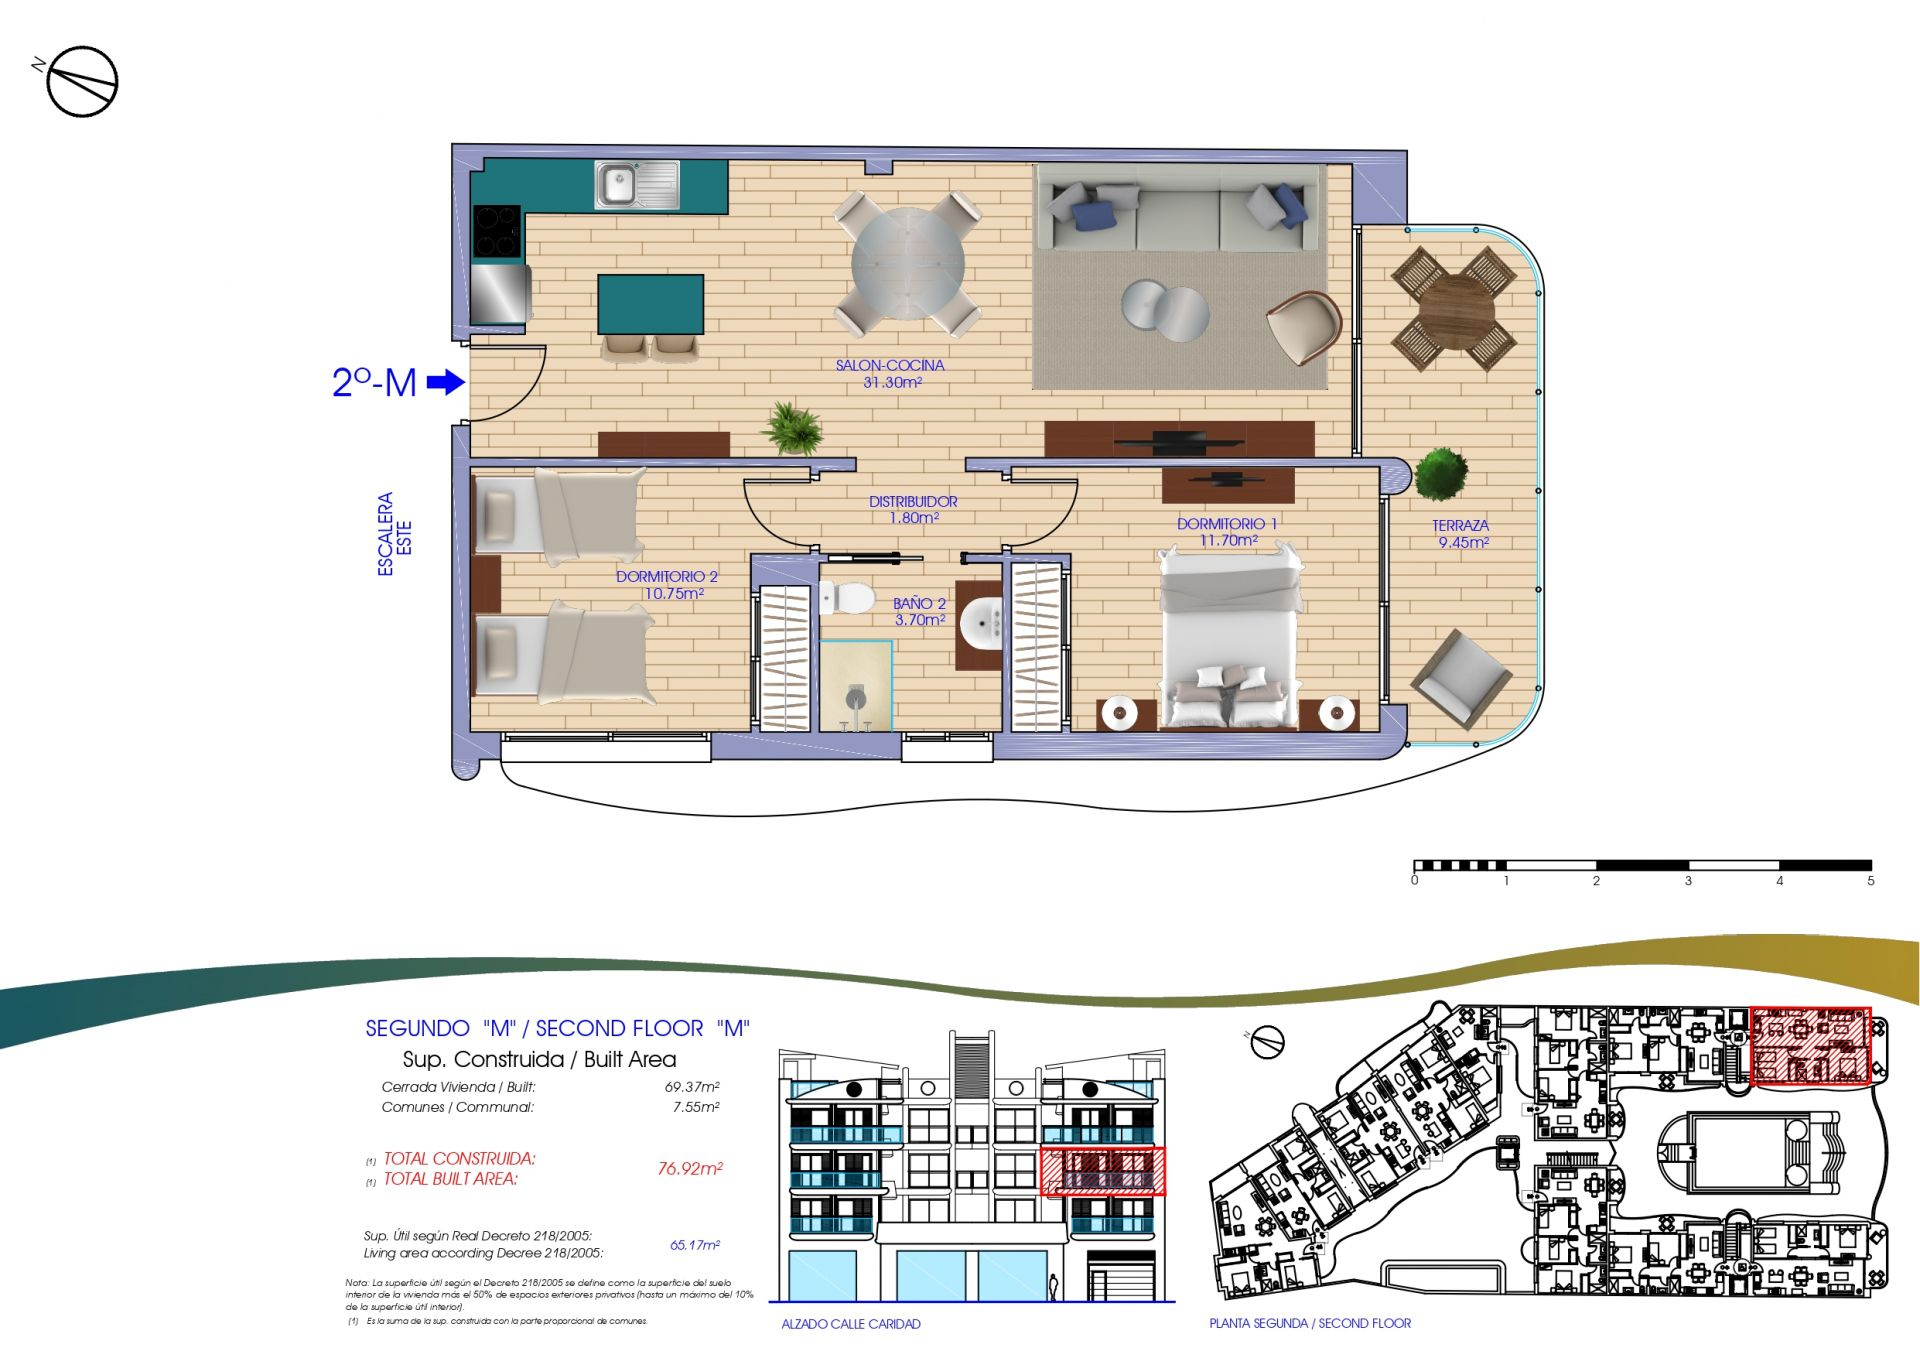 2m - Ventura Estepona | Compra de casa en Estepona